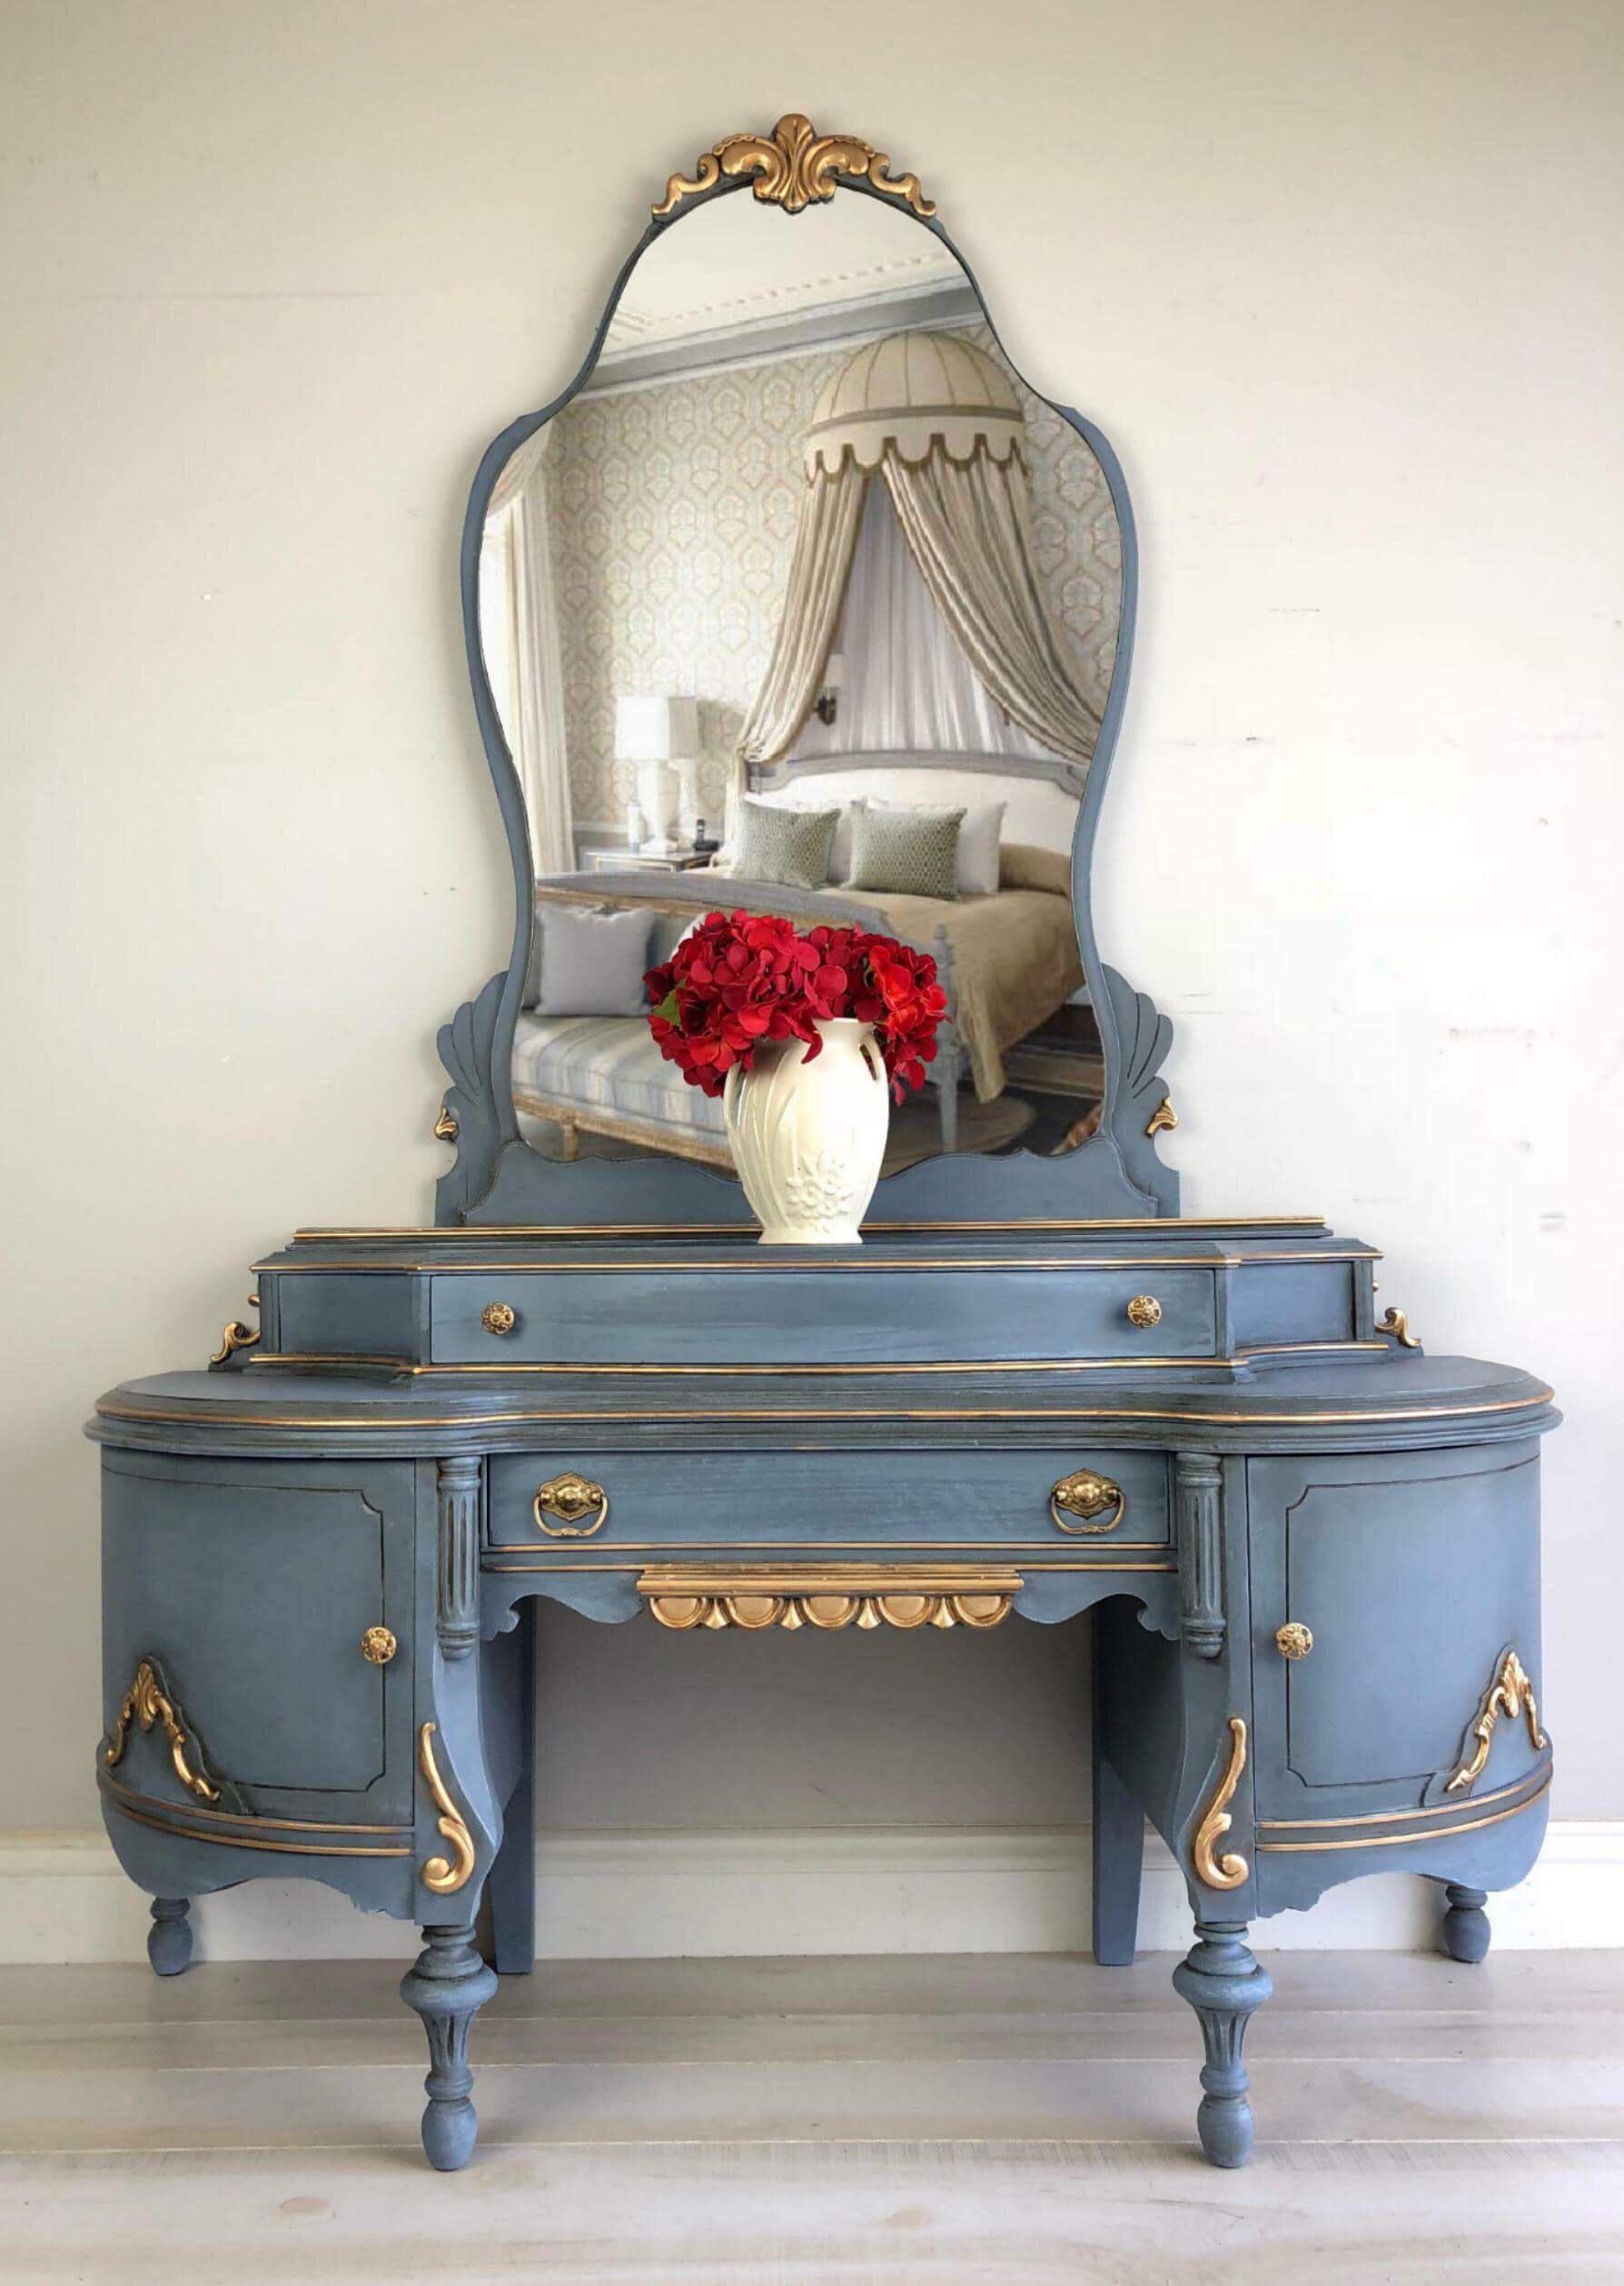 painted furniture vintage vanity makeup mirror farmhouse vanity table tampa